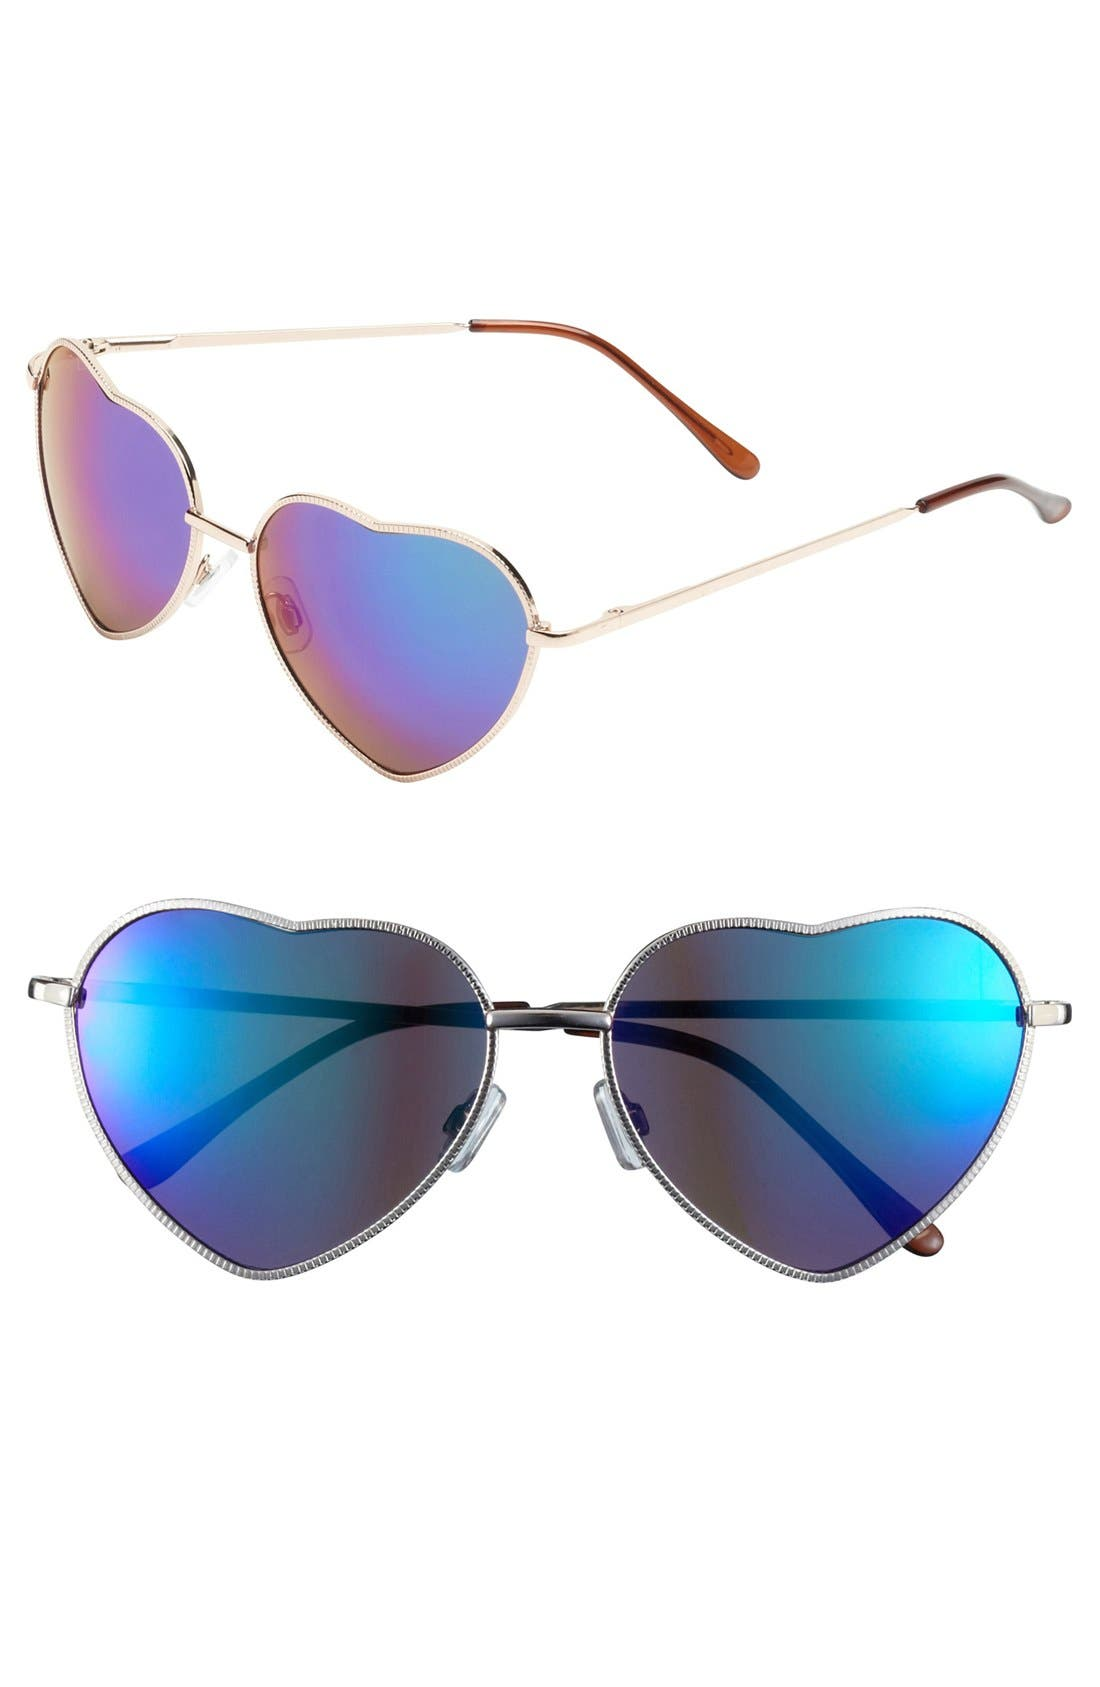 Alternate Image 1 Selected - BP. 'Flash' Heart Shaped Sunglasses